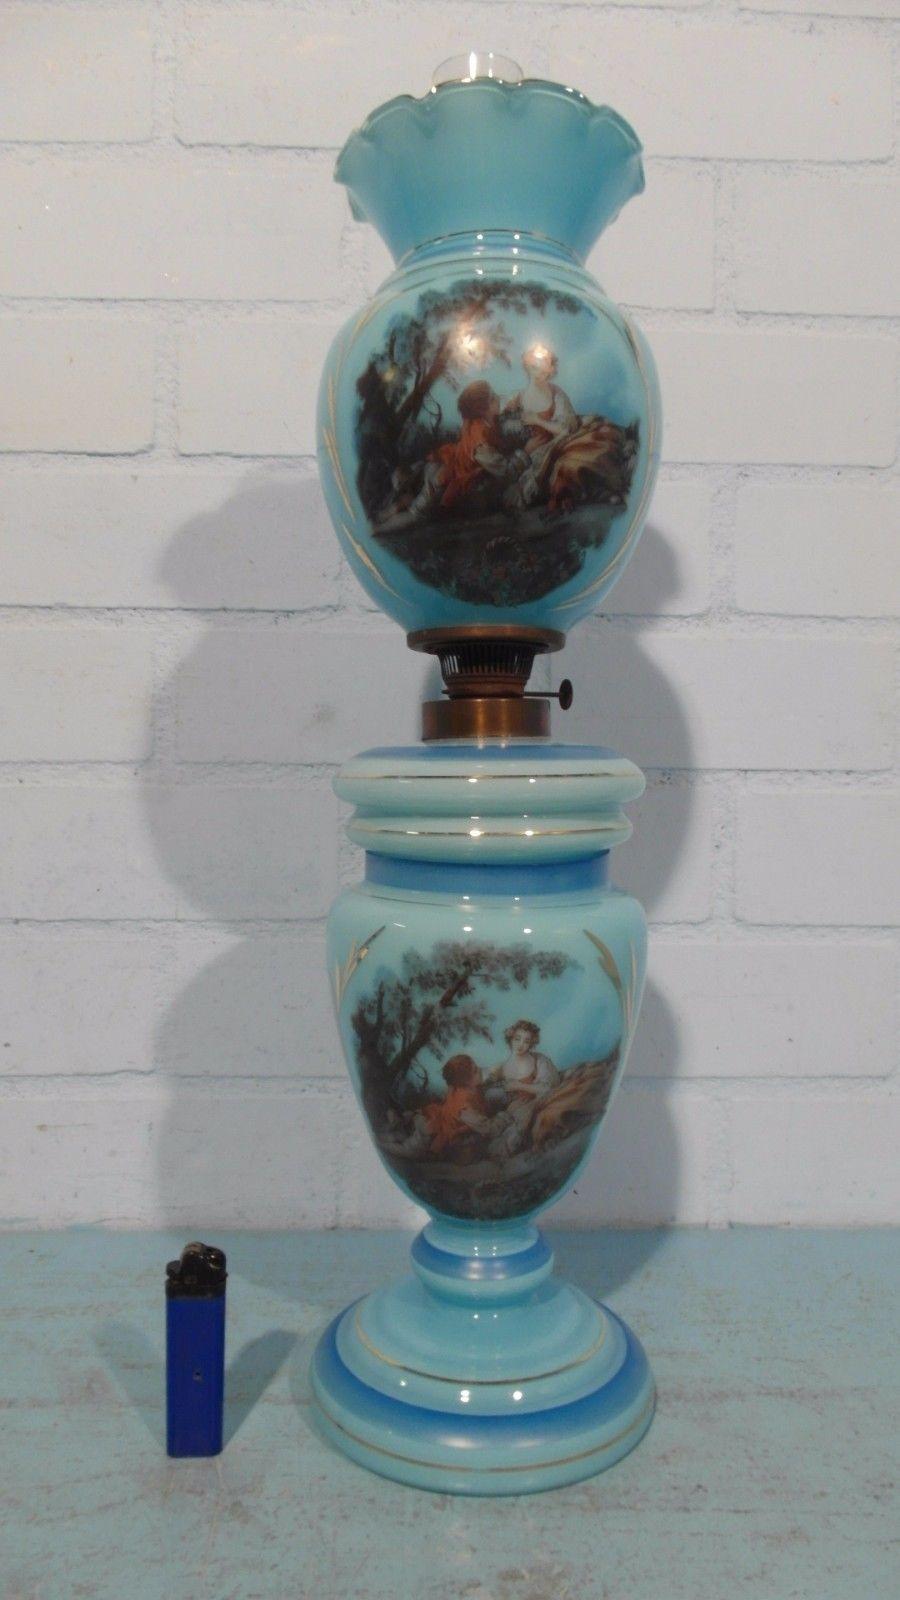 Blue English Glass Parlor Oil Lamp with Fragonard Scene | eBay